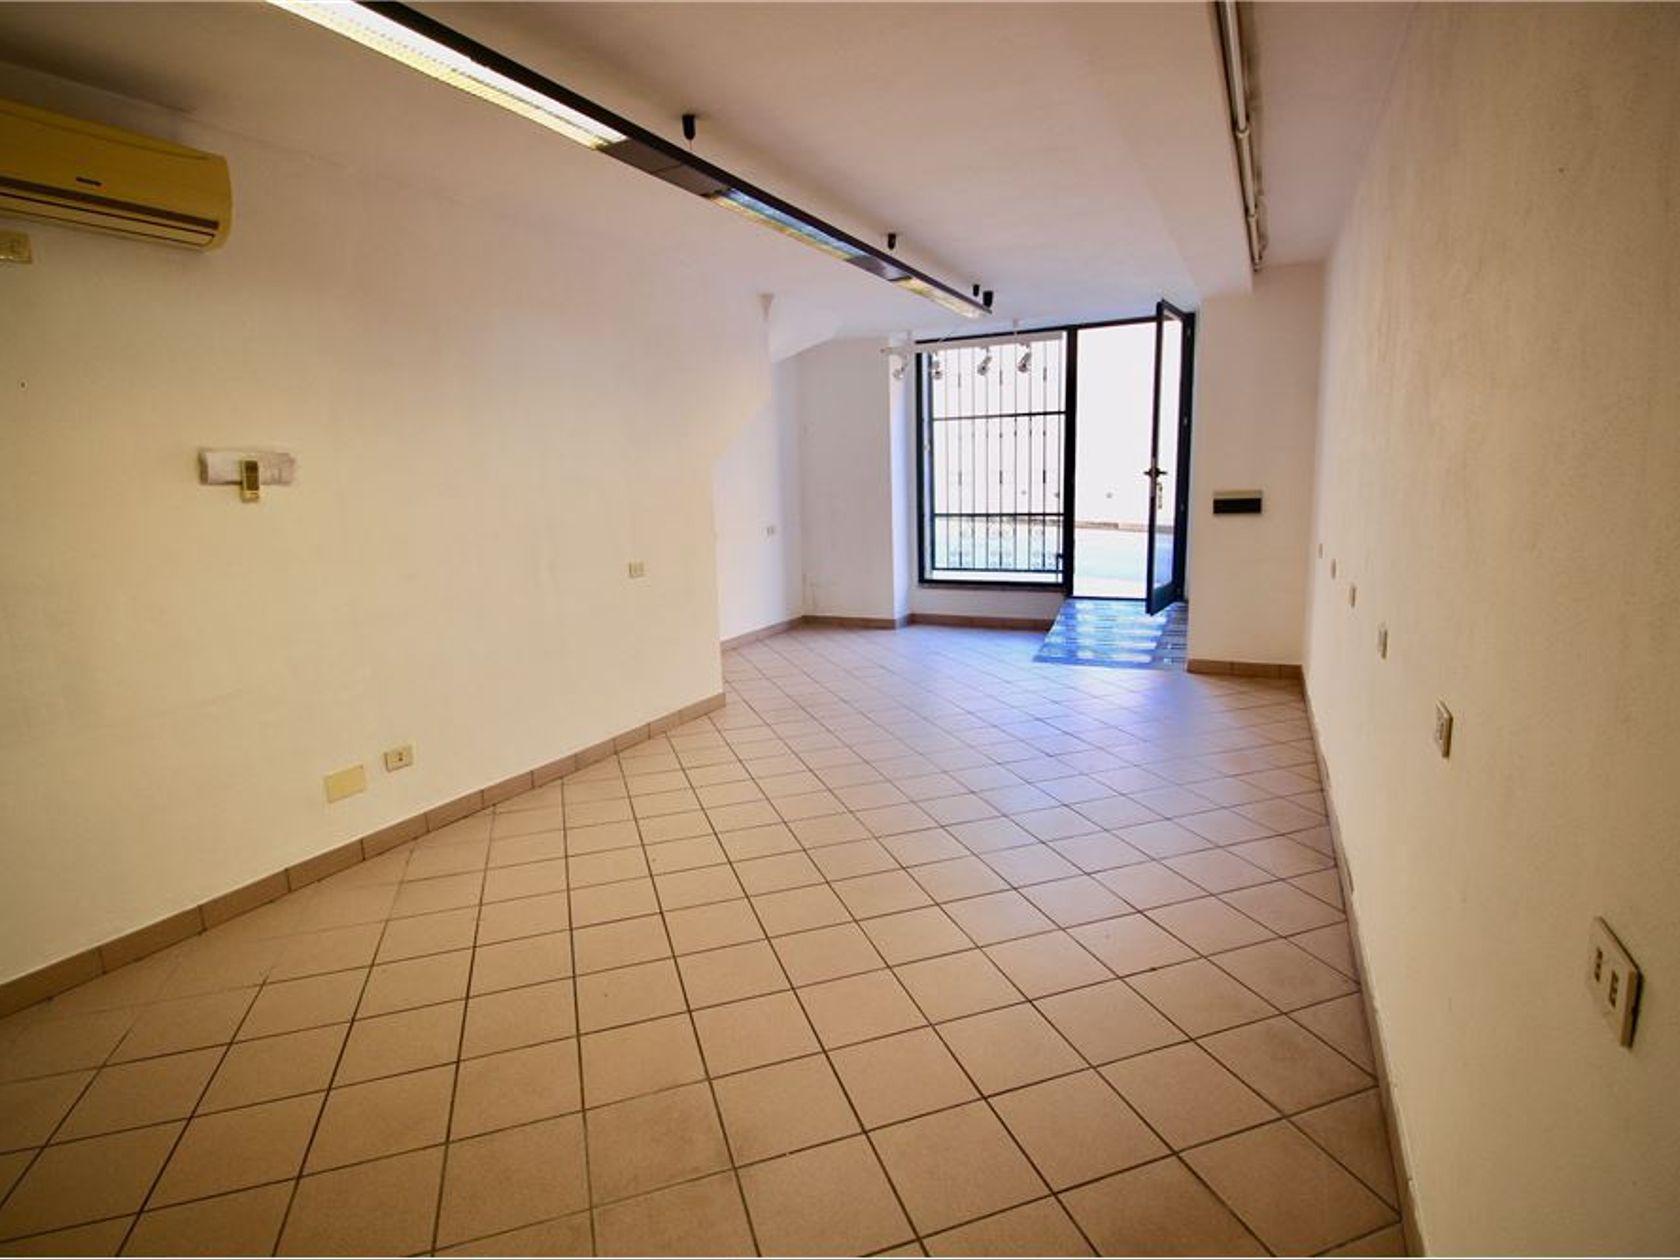 Appartamento Ss-centro, Sassari, SS Vendita - Foto 33